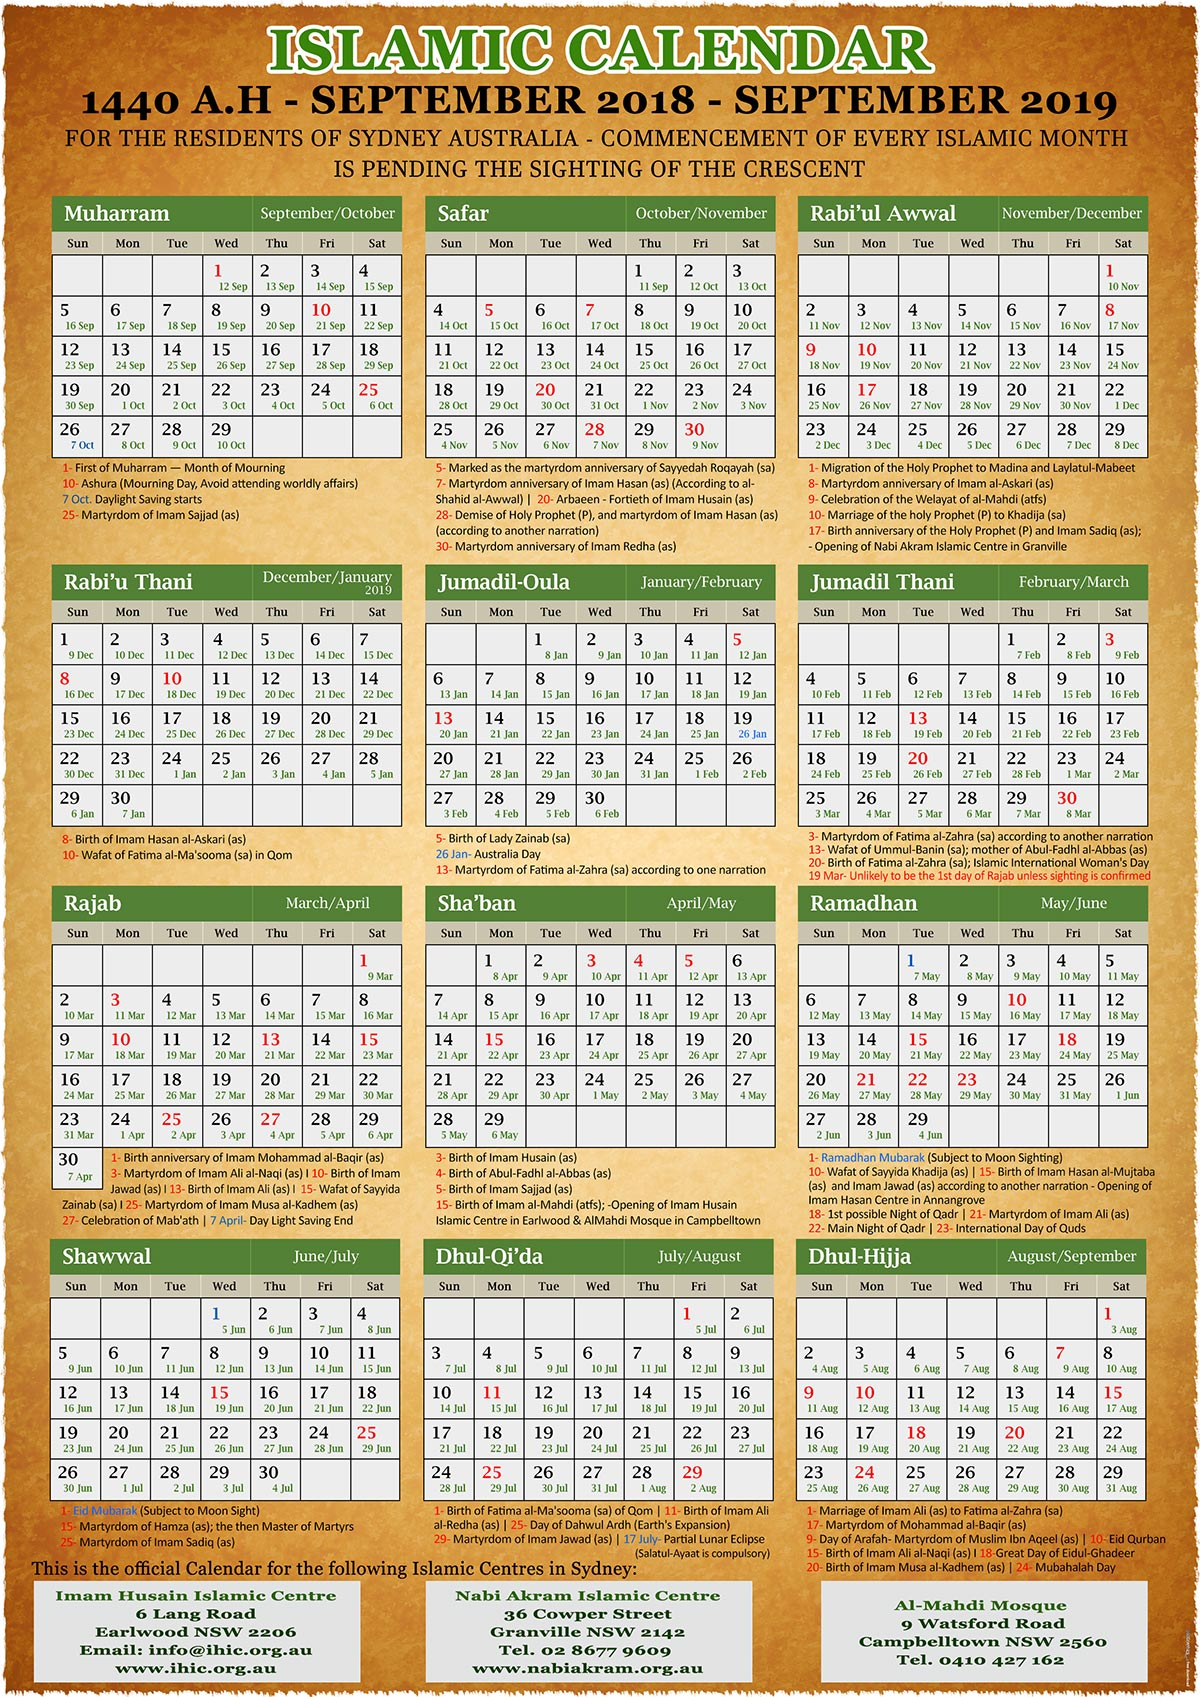 Calendar 2019 Islam Annual Islamic Calendar 1440 A.H. (2019) – Imam Husain Islamic Centre